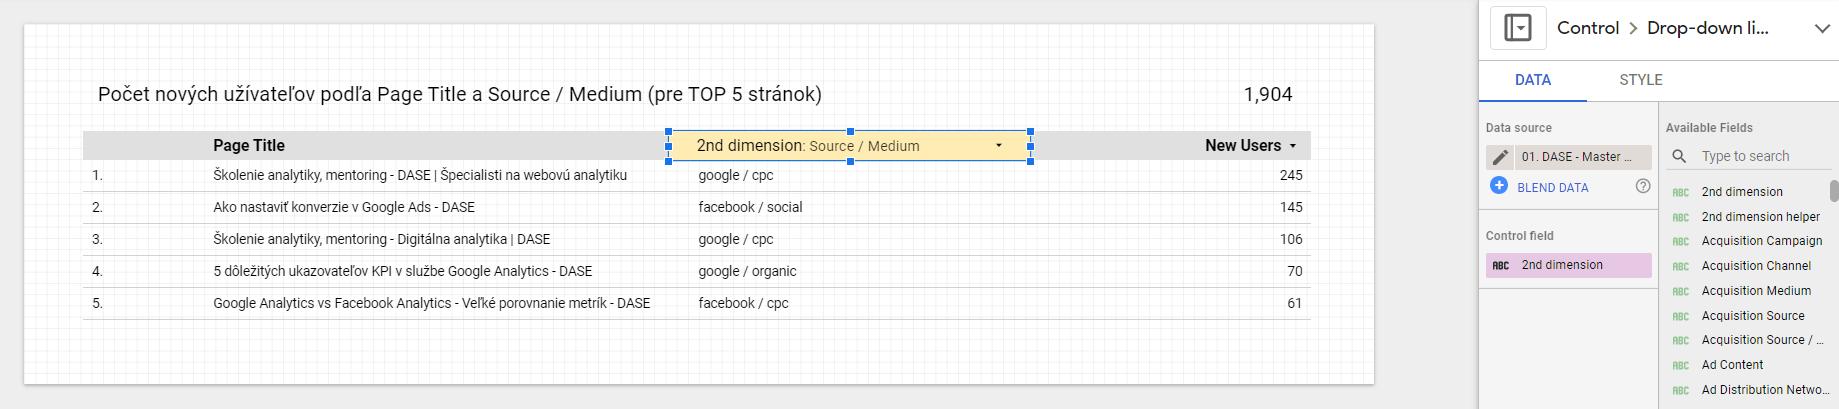 novinky - Google Data Studio Parameters